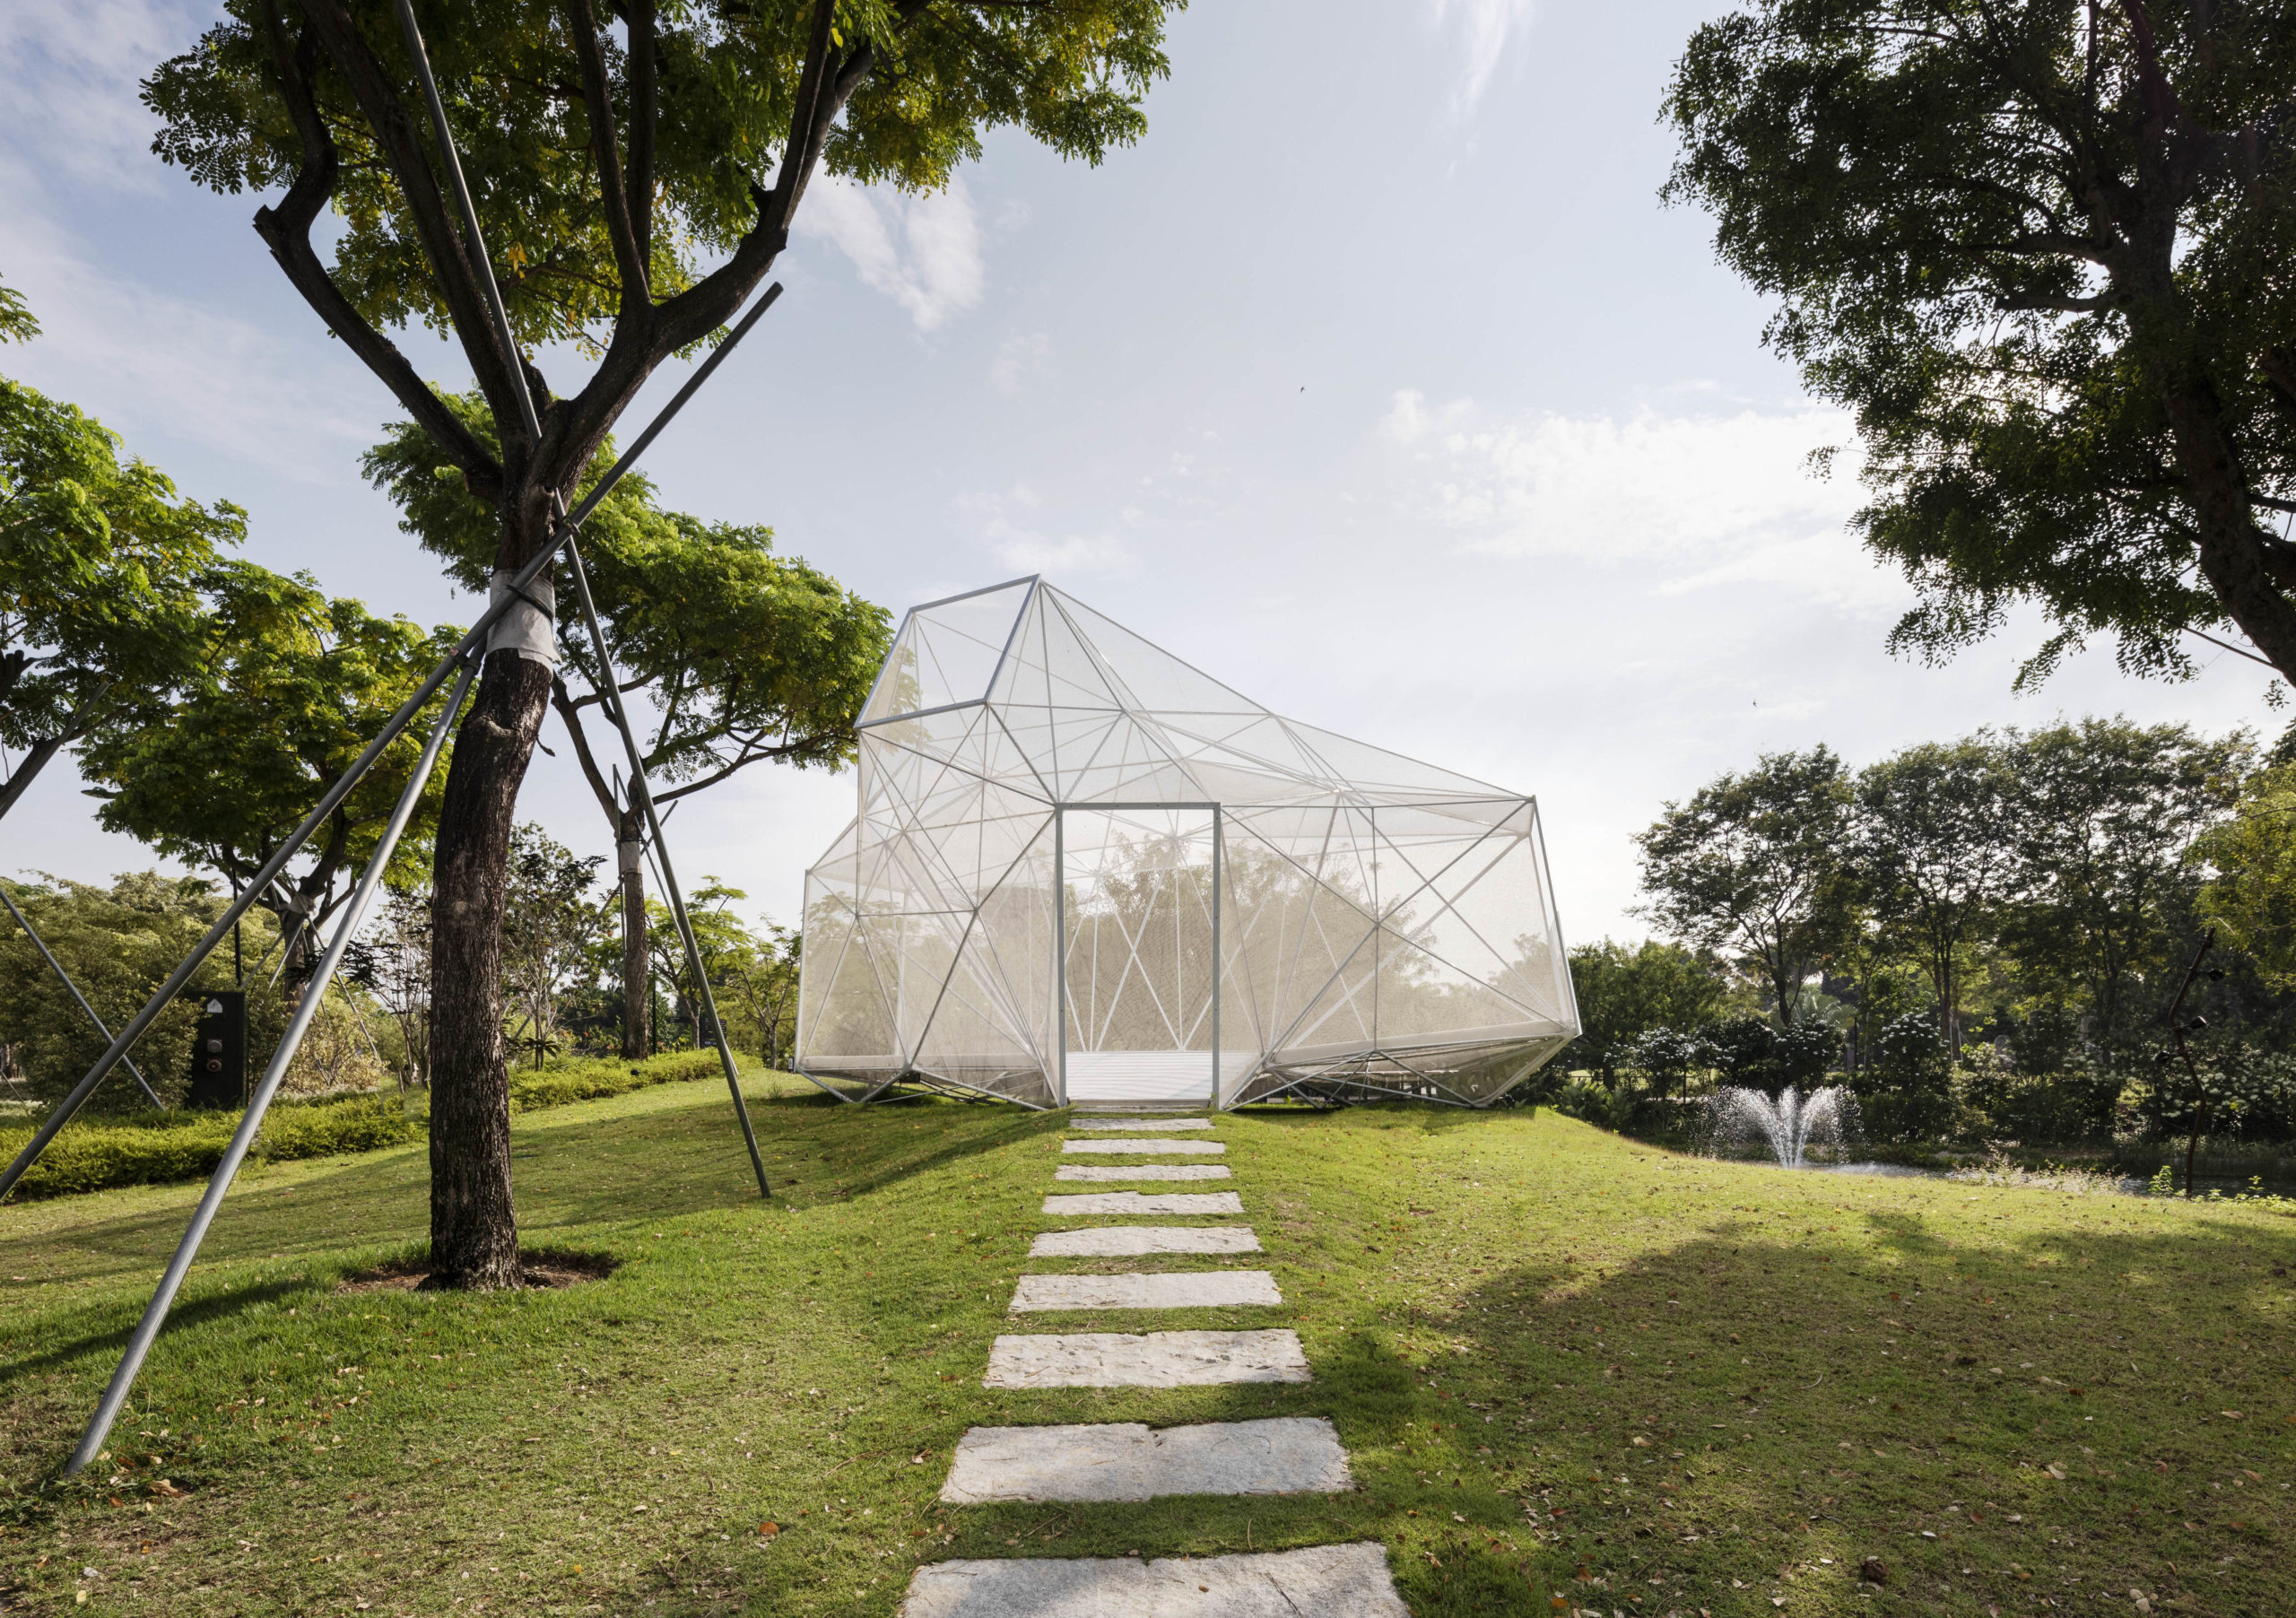 Des designs durables primés